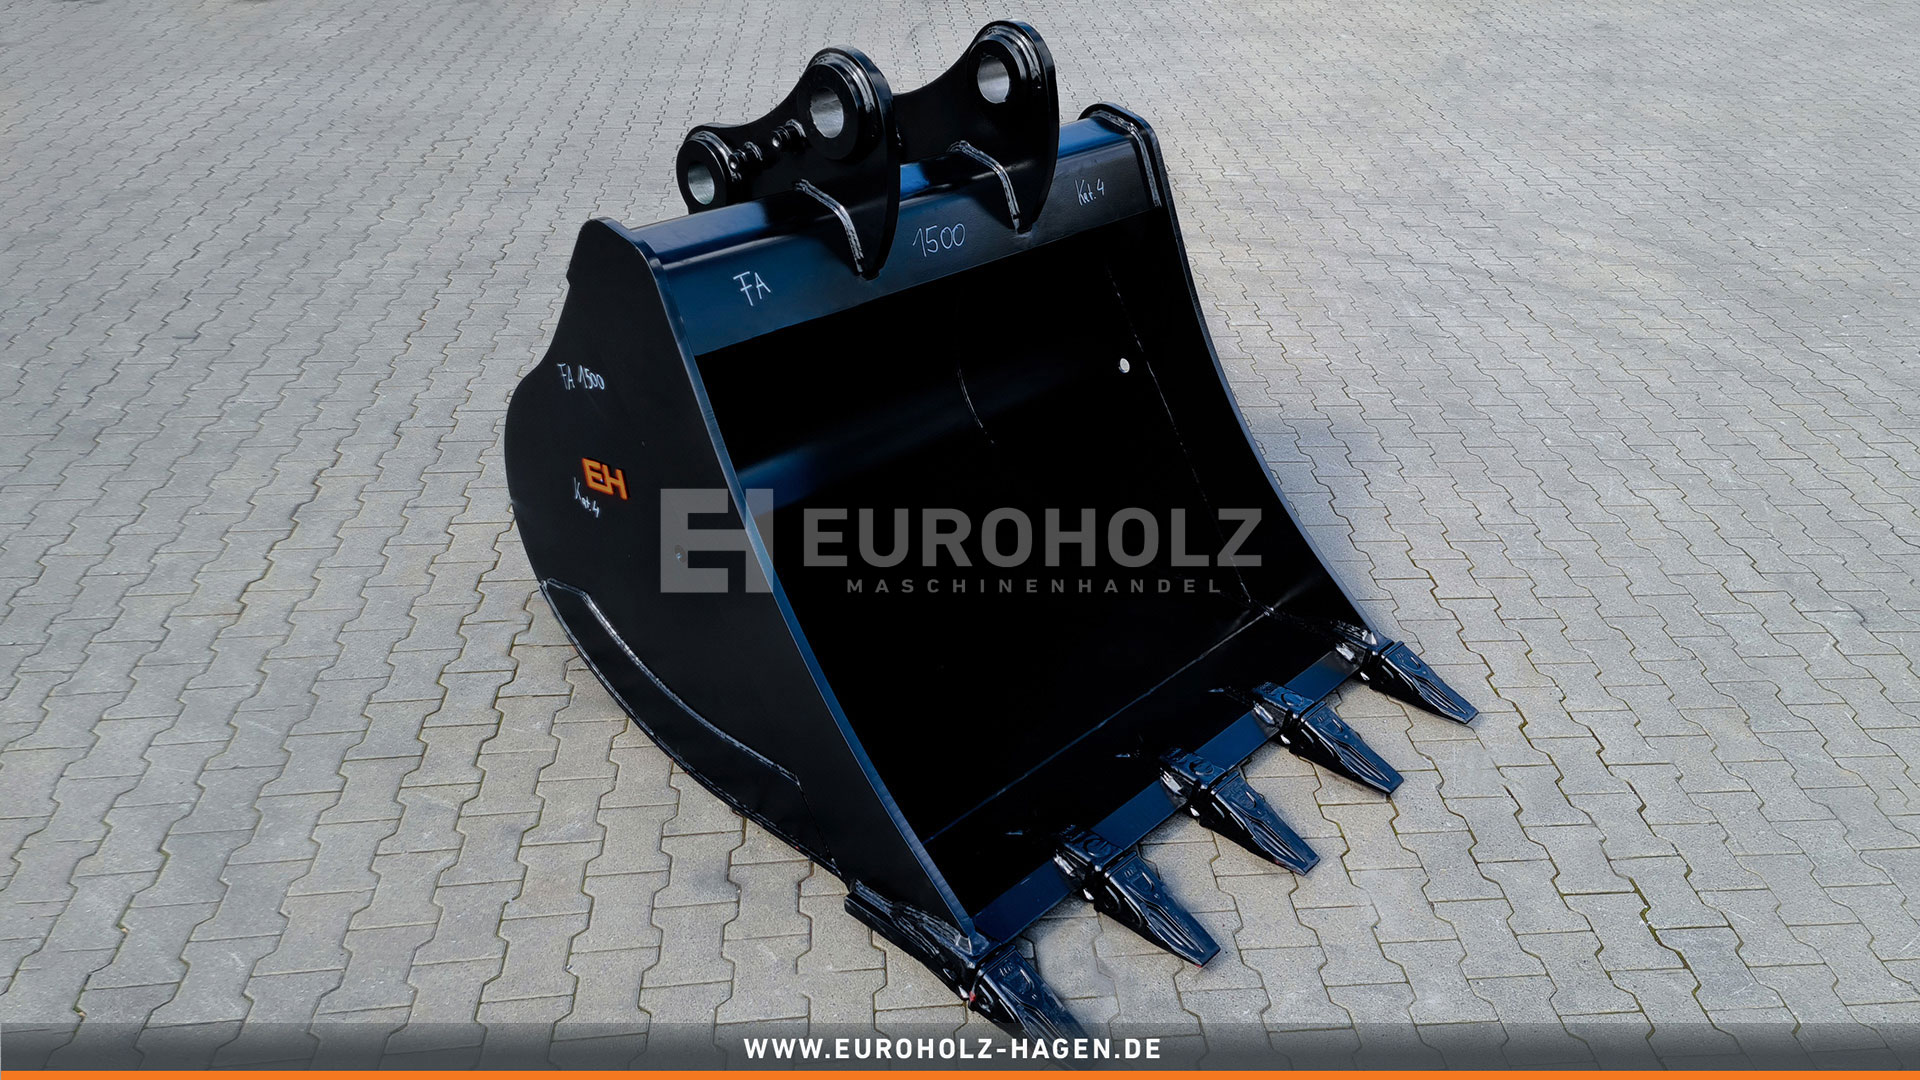 Tieflöffel passend für CAT 329 (Festanbau) / 1500 mm / Kat. 4G